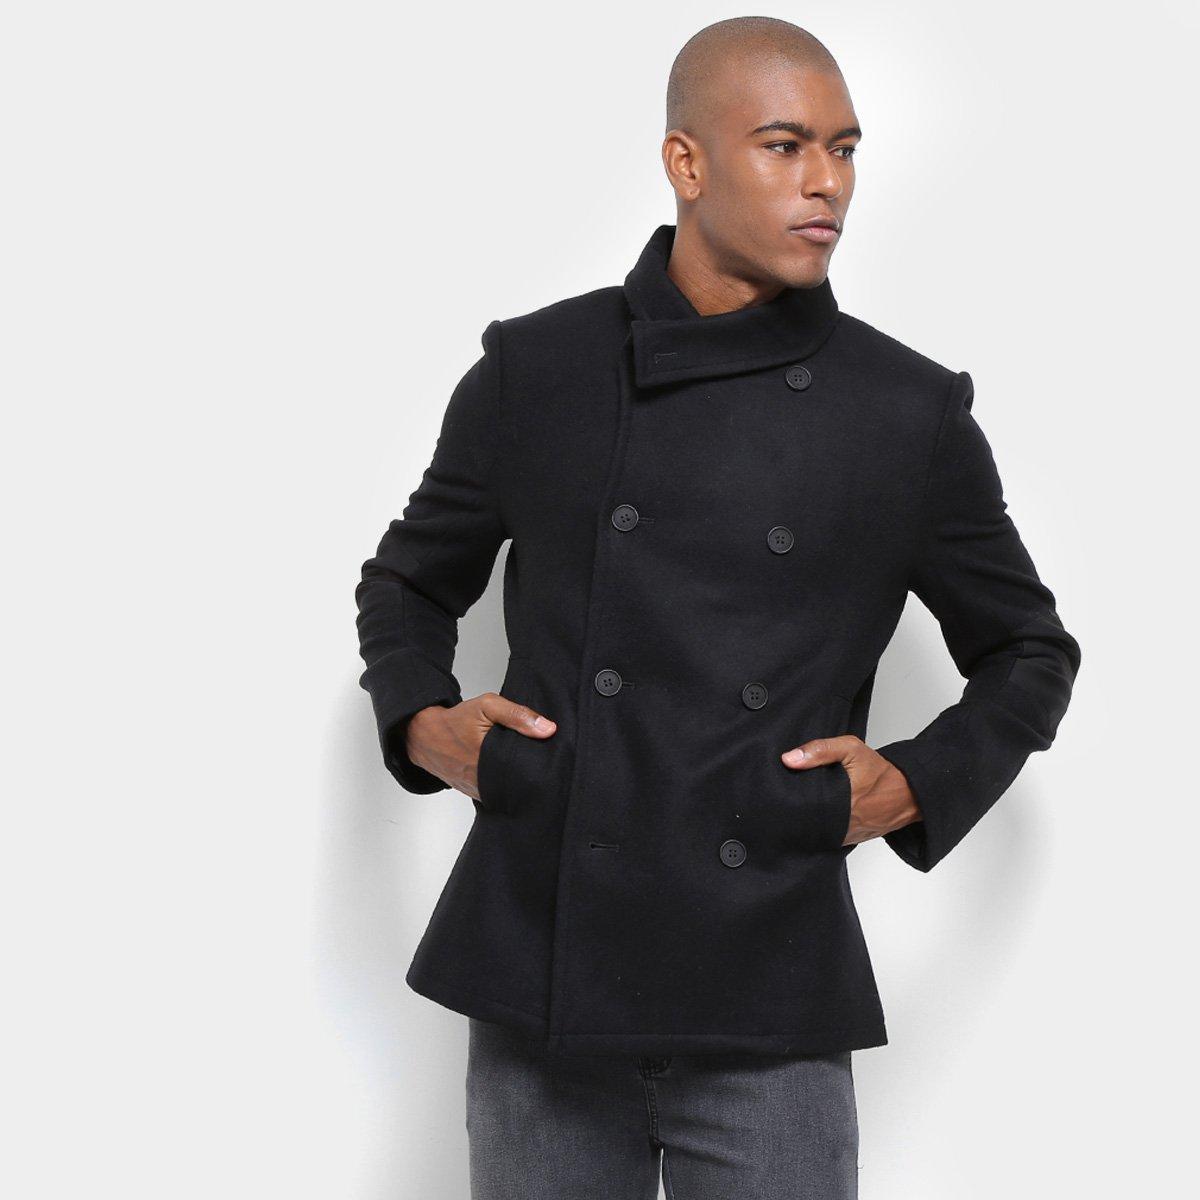 8b379a1ad8484 Casaco Lã Calvin Klein Masculino Gola Assimétrica Botões Masculino - Preto  - Compre Agora